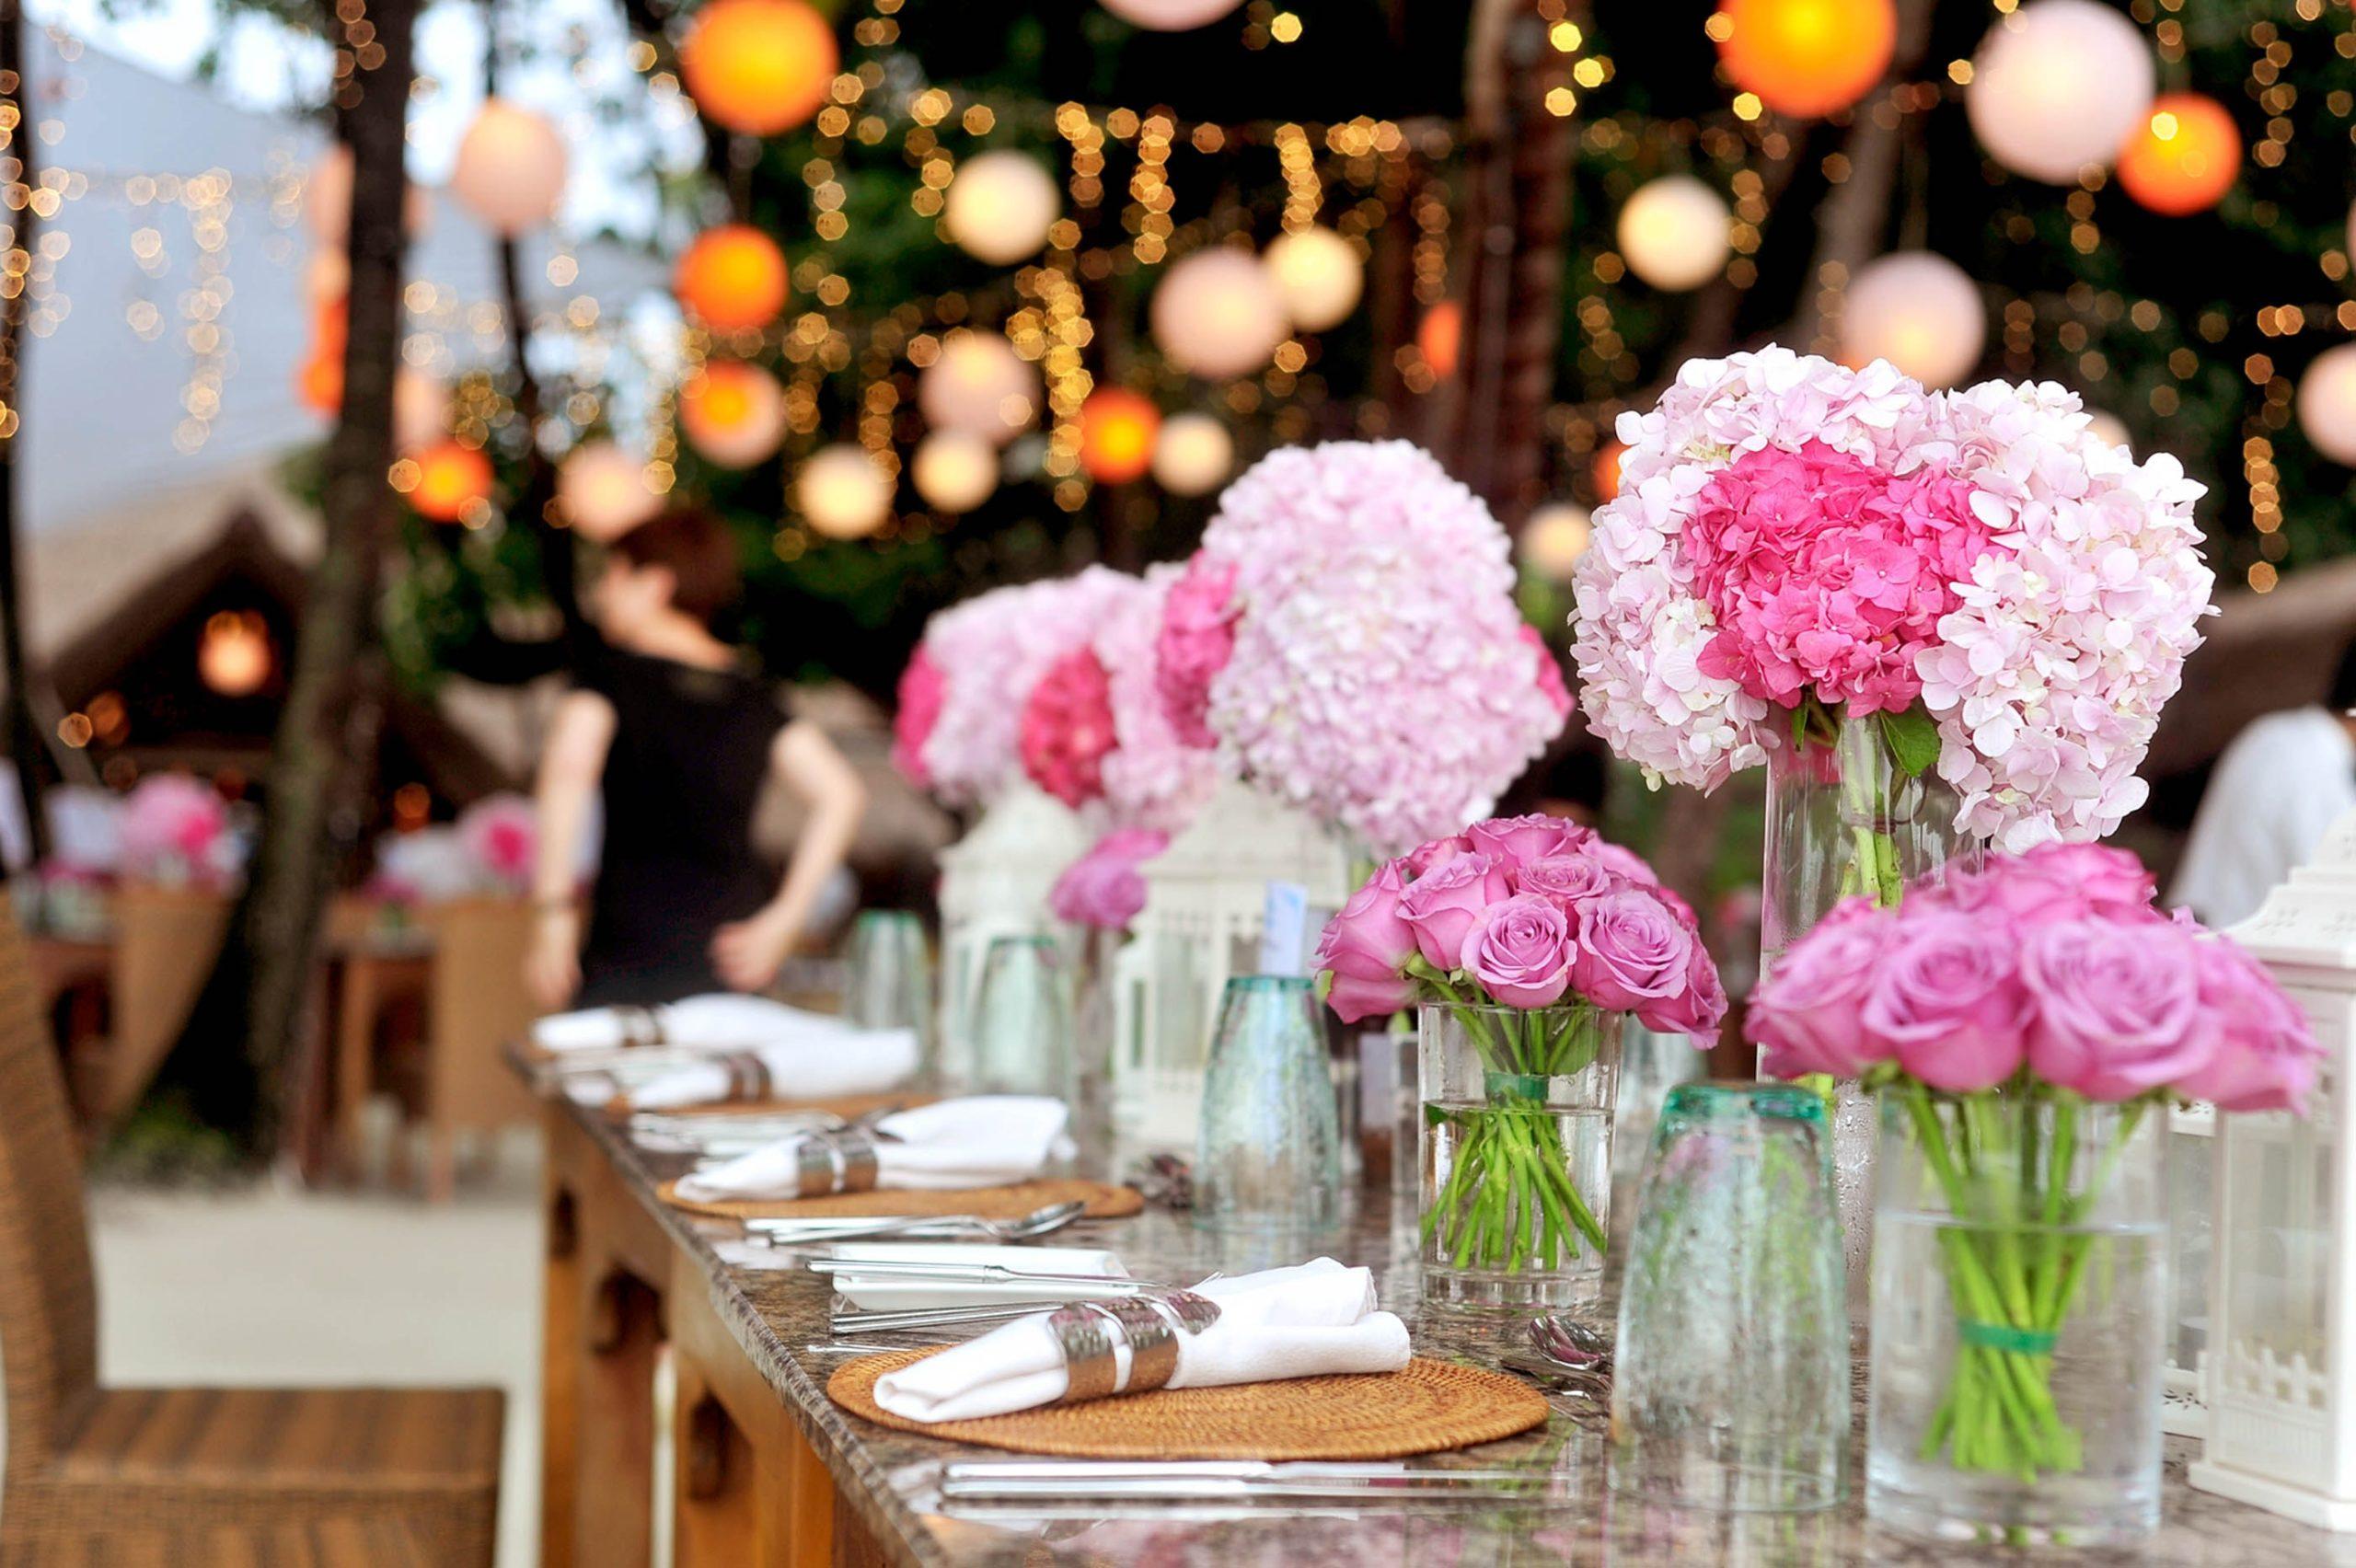 Diy Wedding Table Decorations Ideas